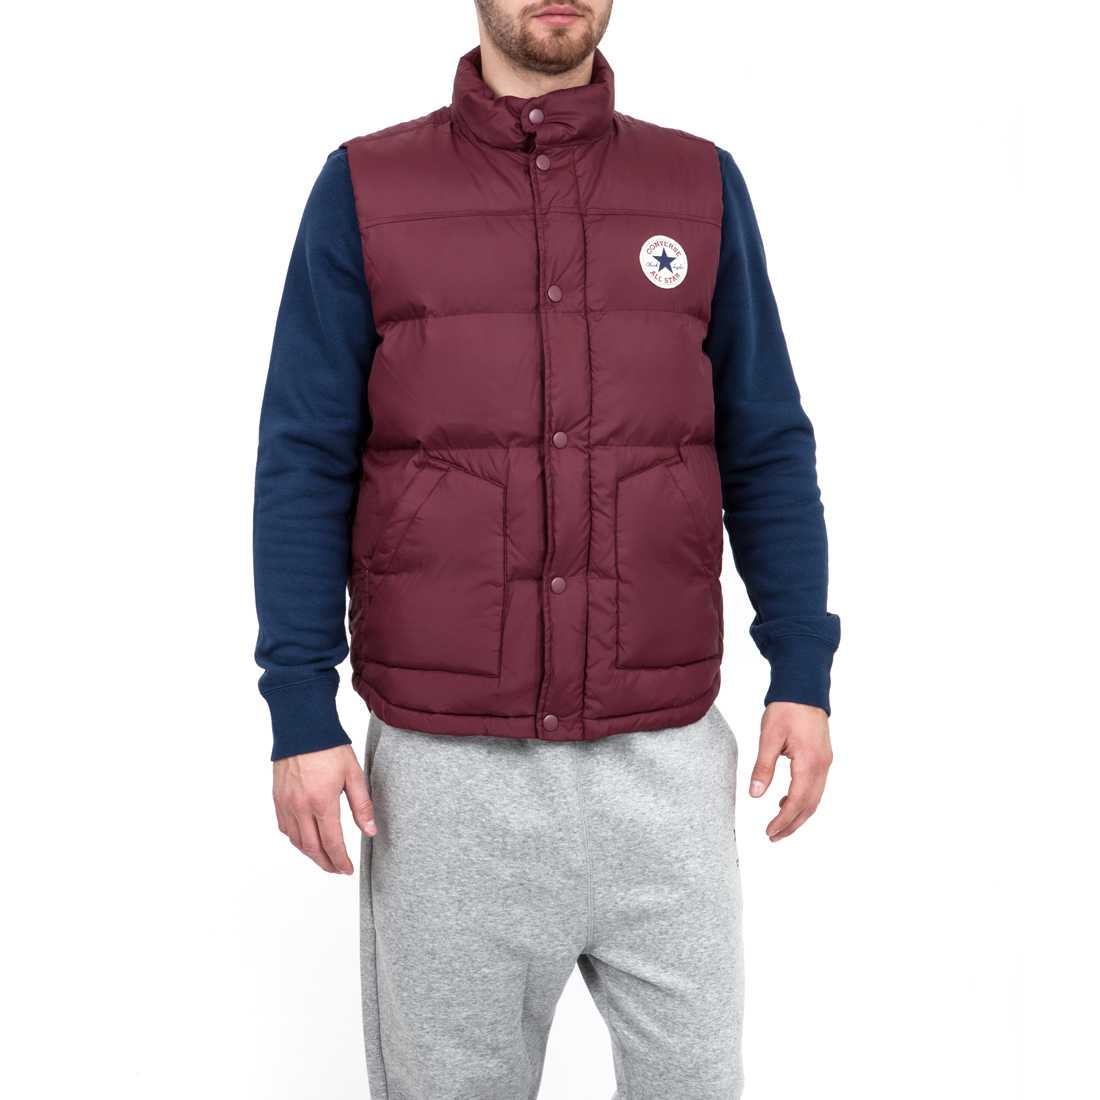 CONVERSE - Ανδρικό μπουφάν Converse μπορντώ ανδρικά ρούχα πανωφόρια γιλέκα